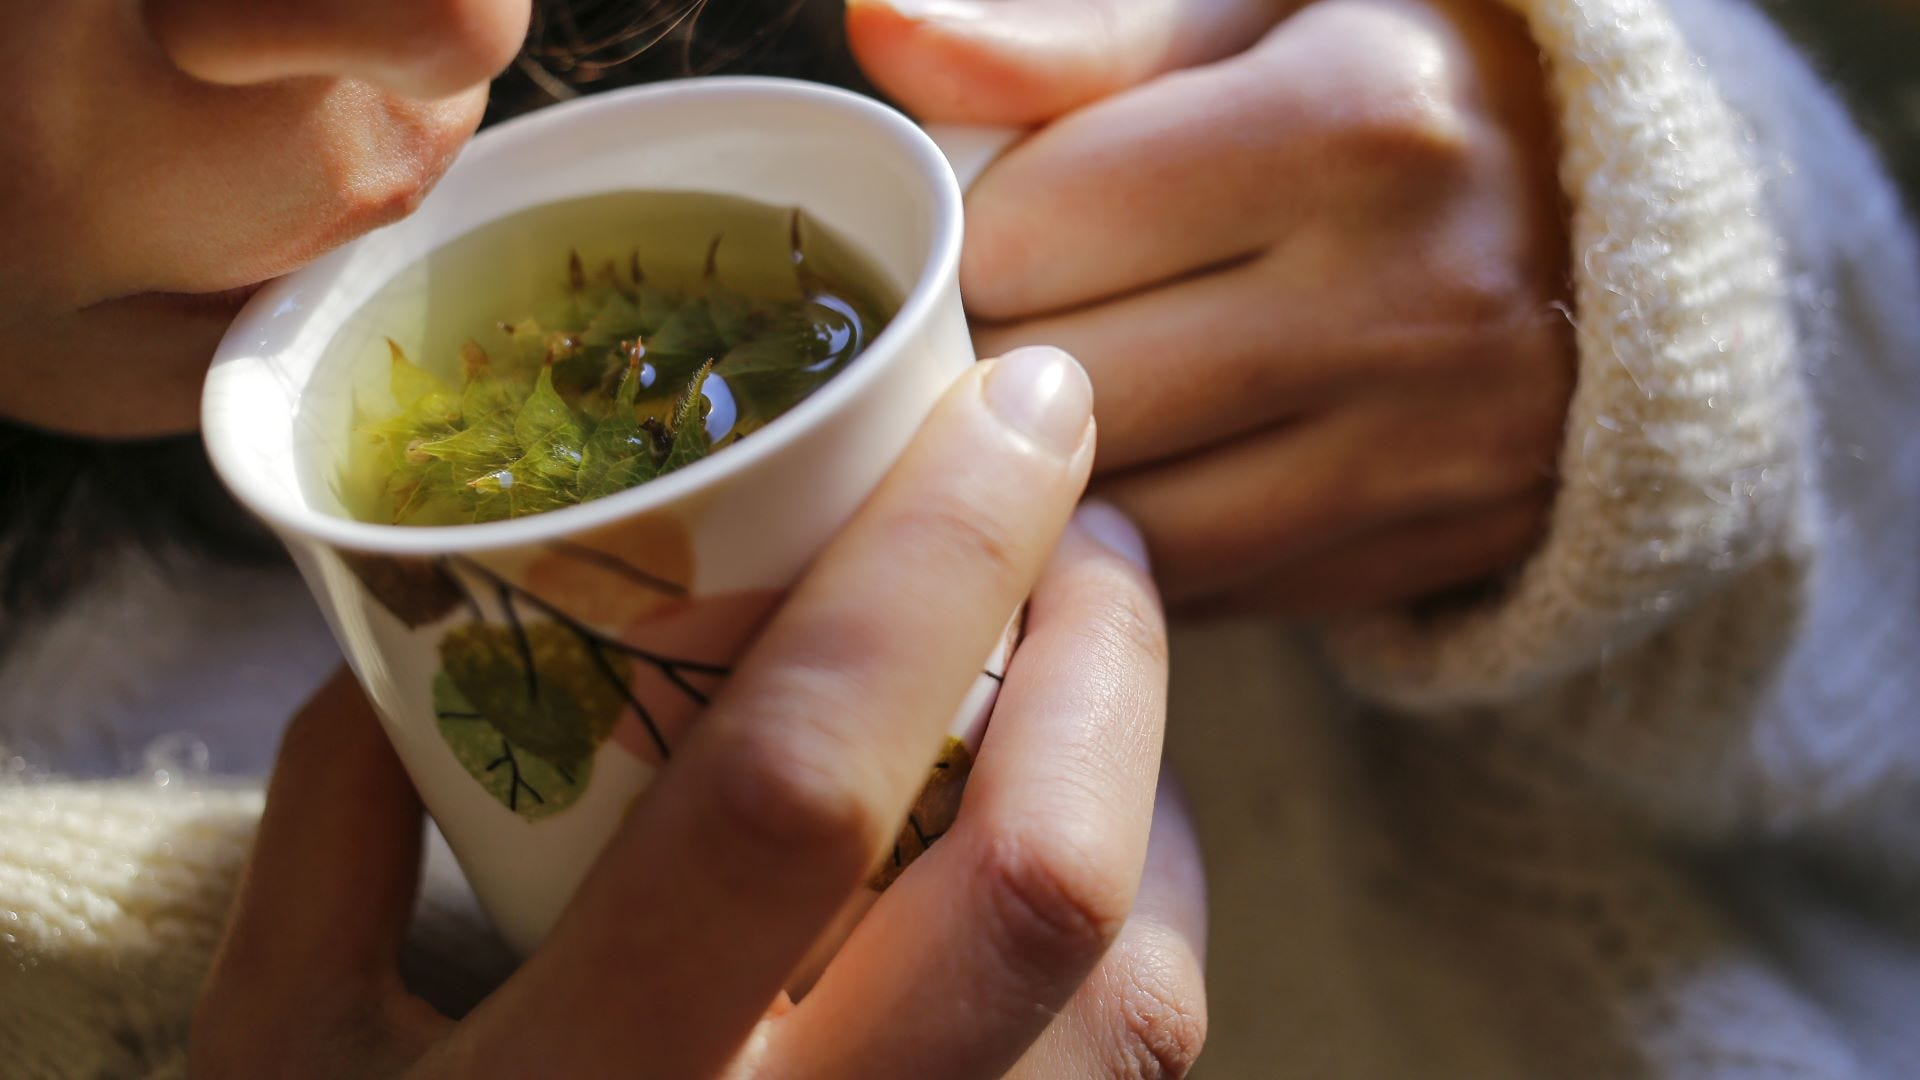 Woman drinking a mug of sage tea.